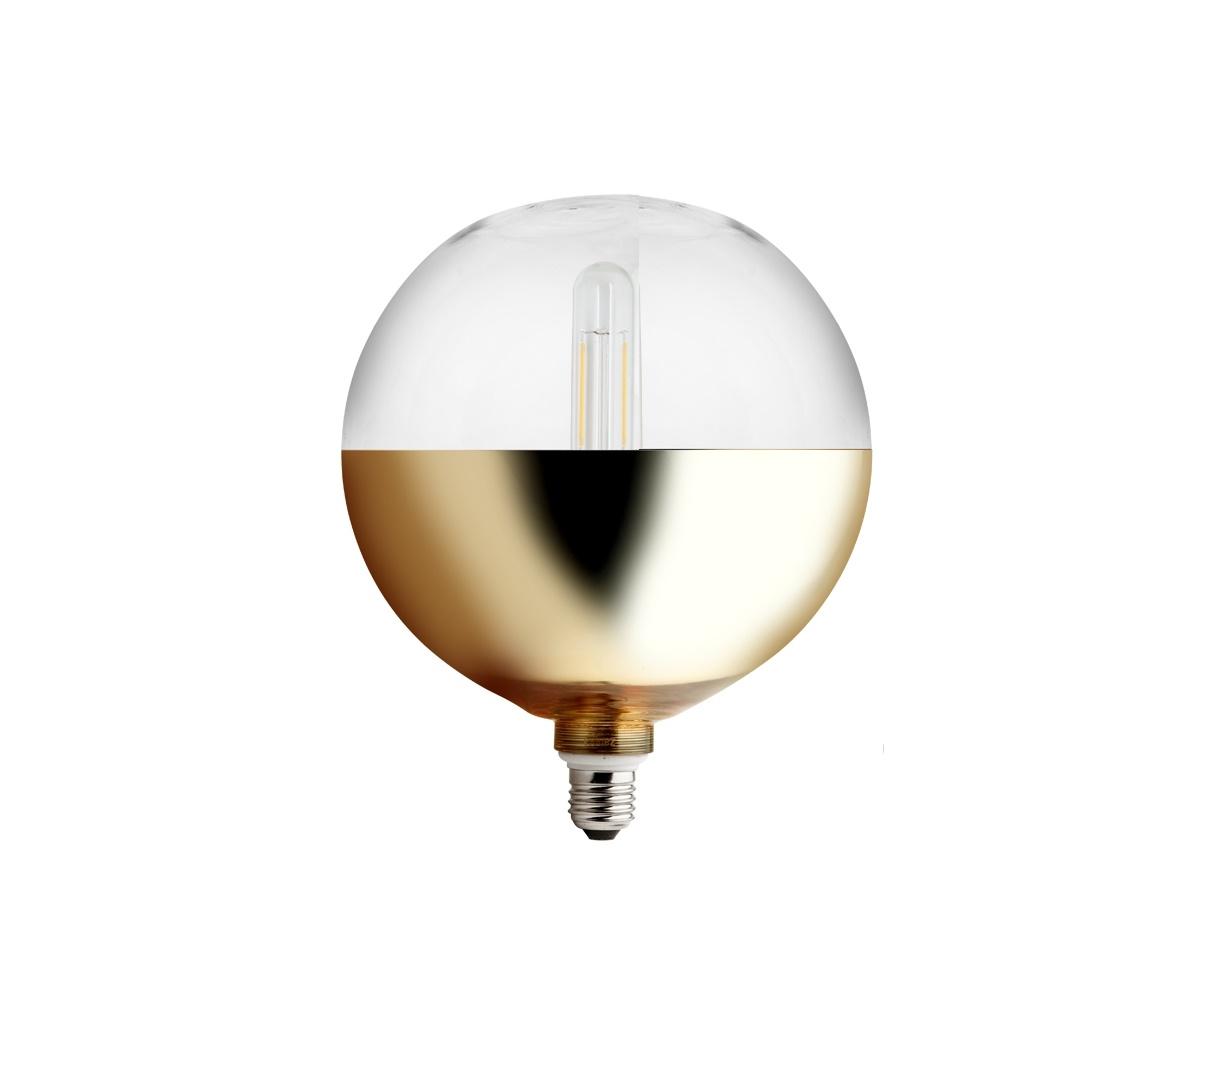 ampoule xxl miroir bas or 20cm e27 led zangra luminaires nedgis. Black Bedroom Furniture Sets. Home Design Ideas